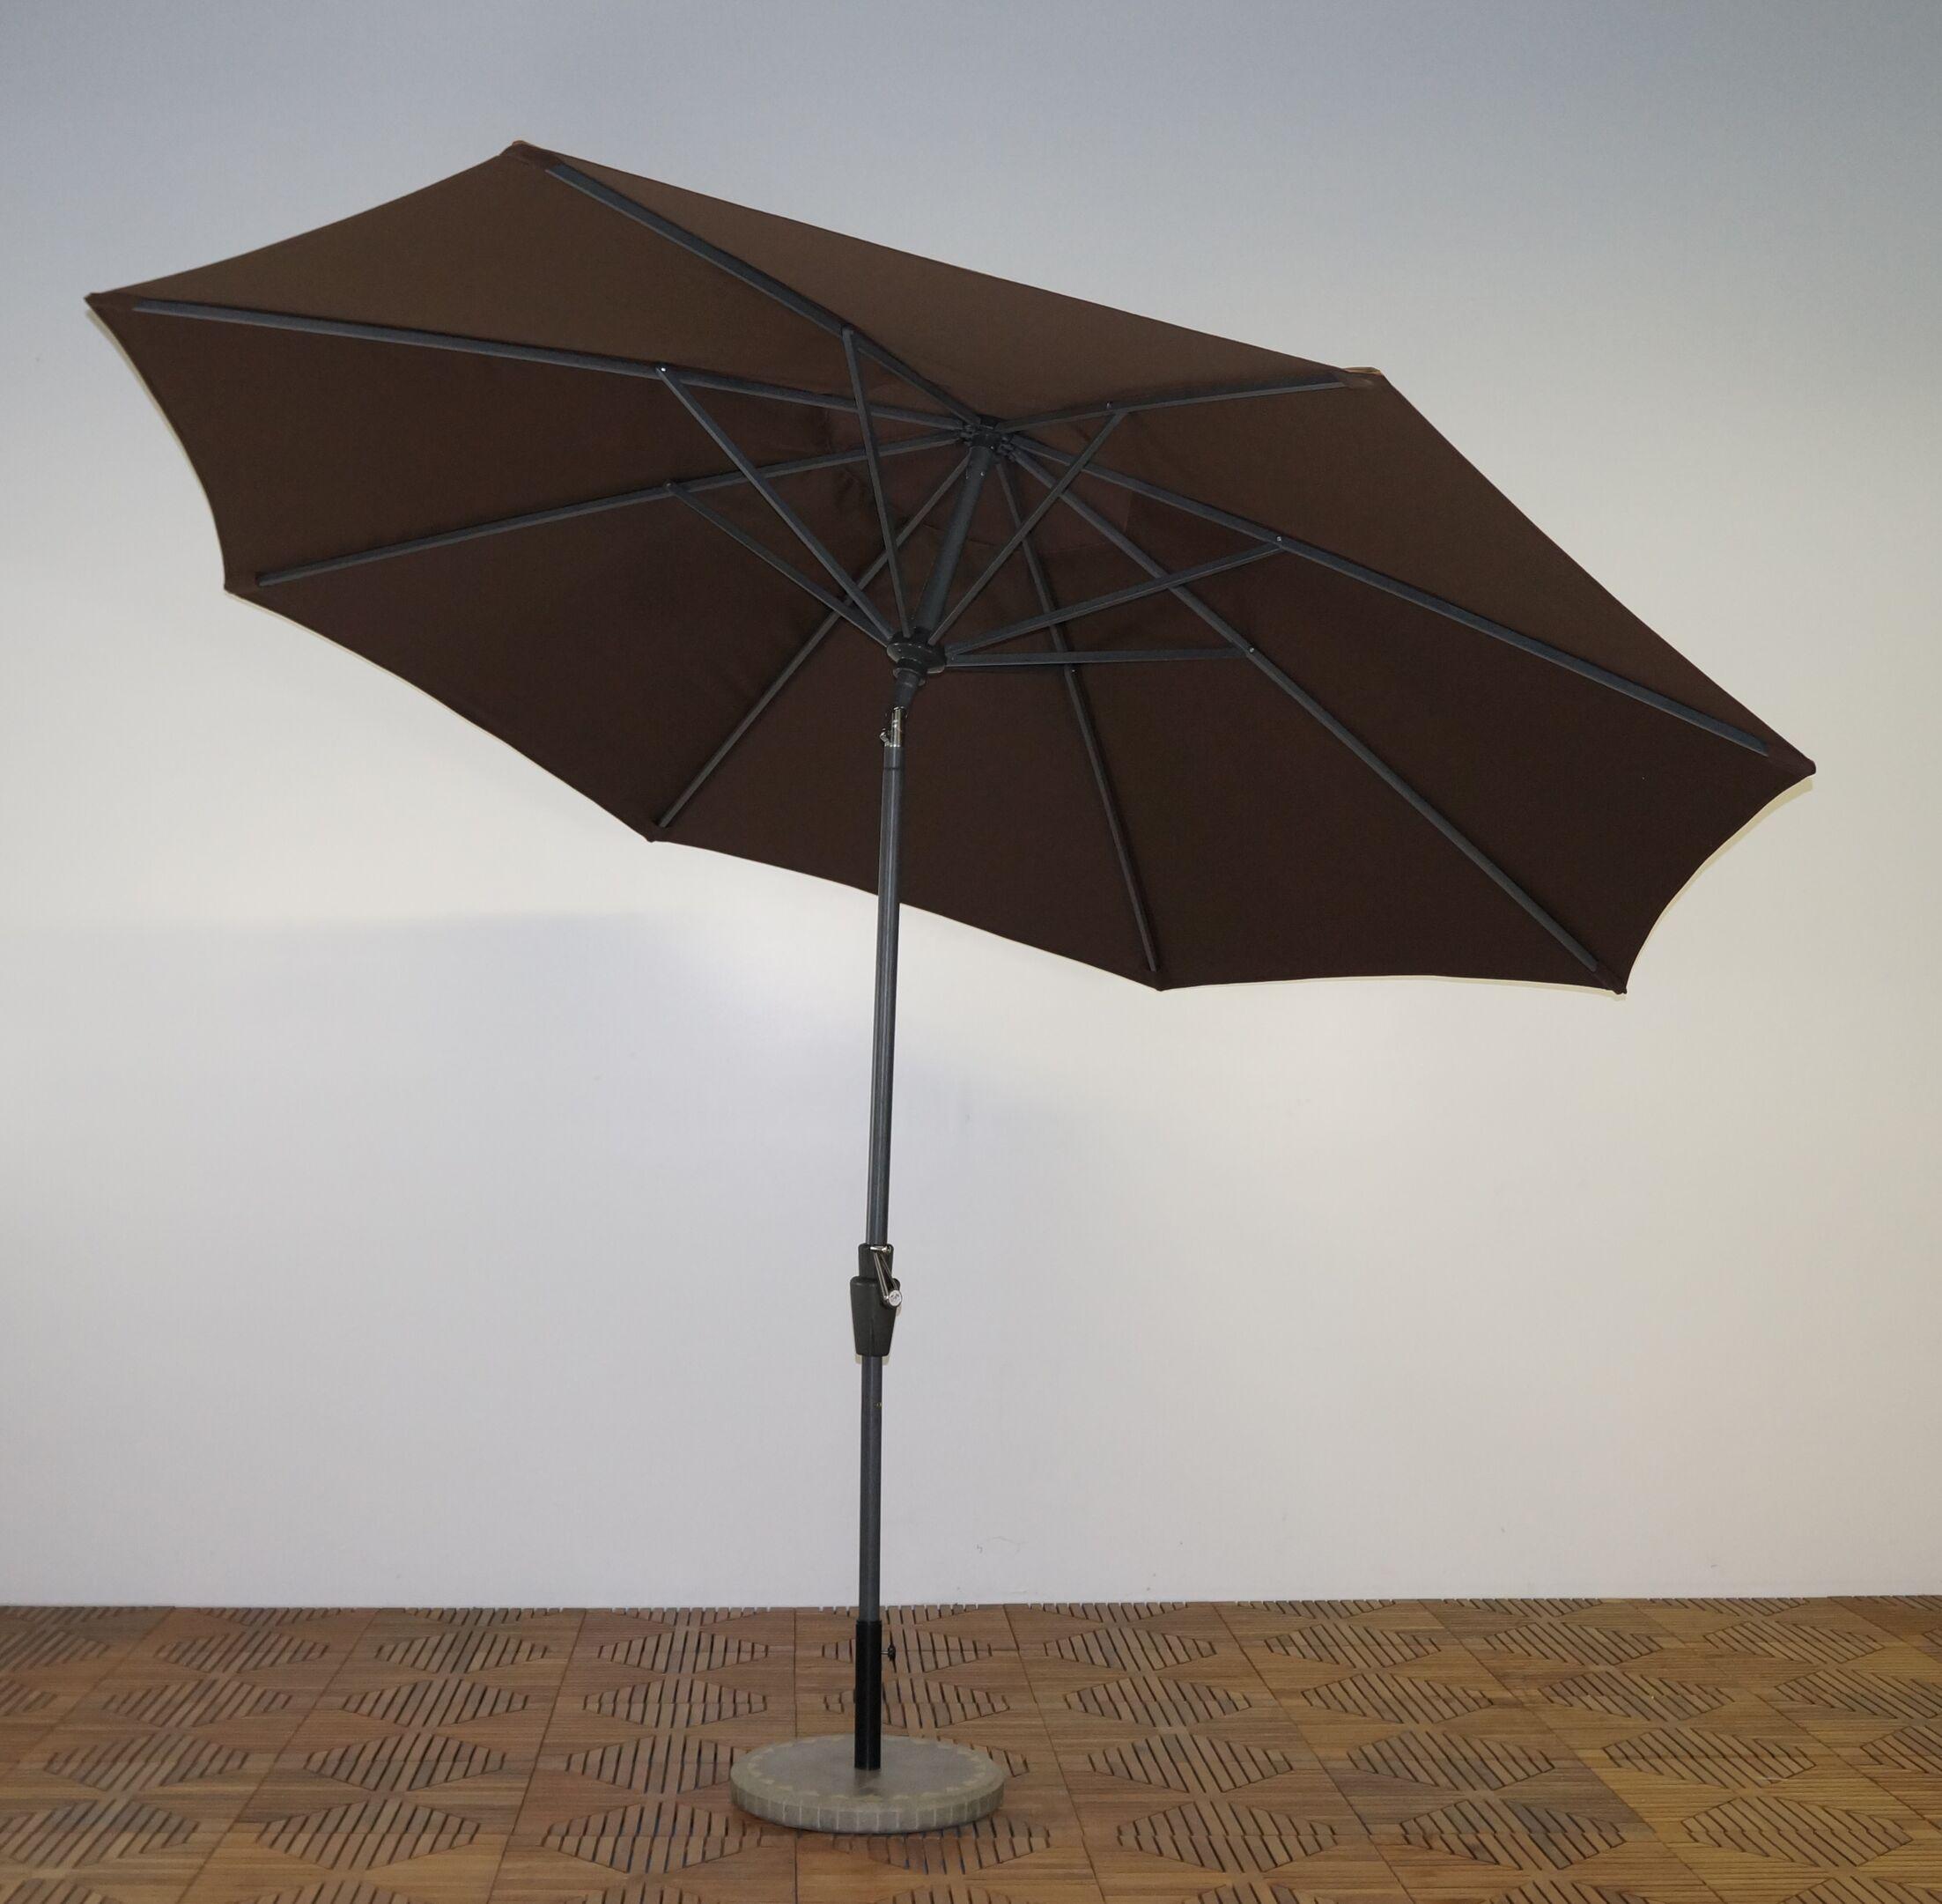 11' Market Umbrella Frame Finish: Durango, Fabric: Kona Brown